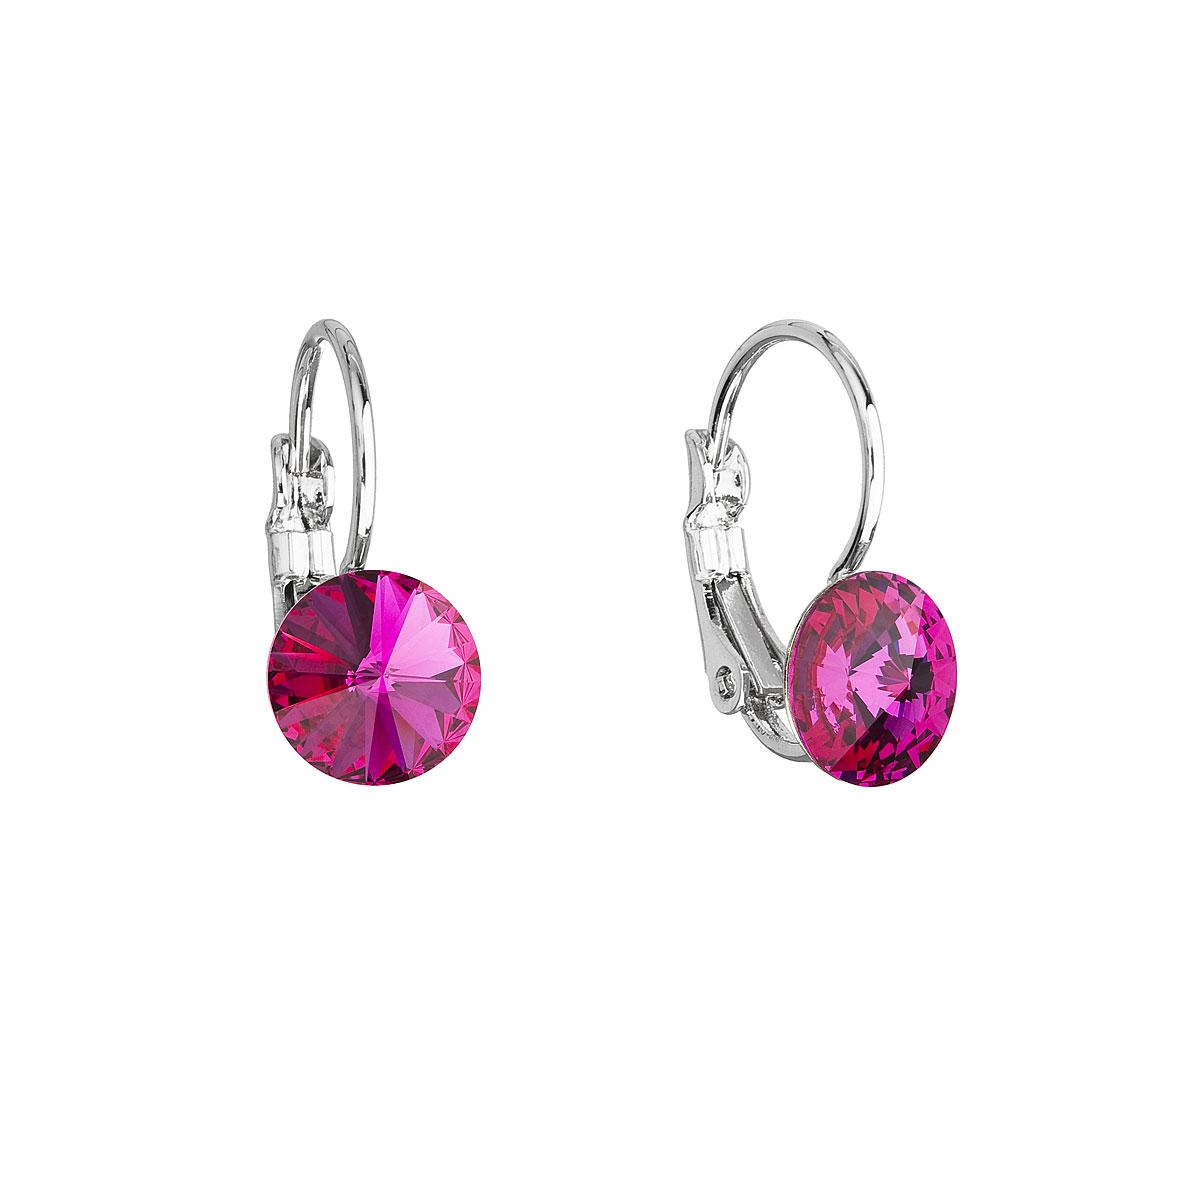 Náušnice bižuterie se Swarovski krystaly růžové kulaté 51031.3 fuchsia